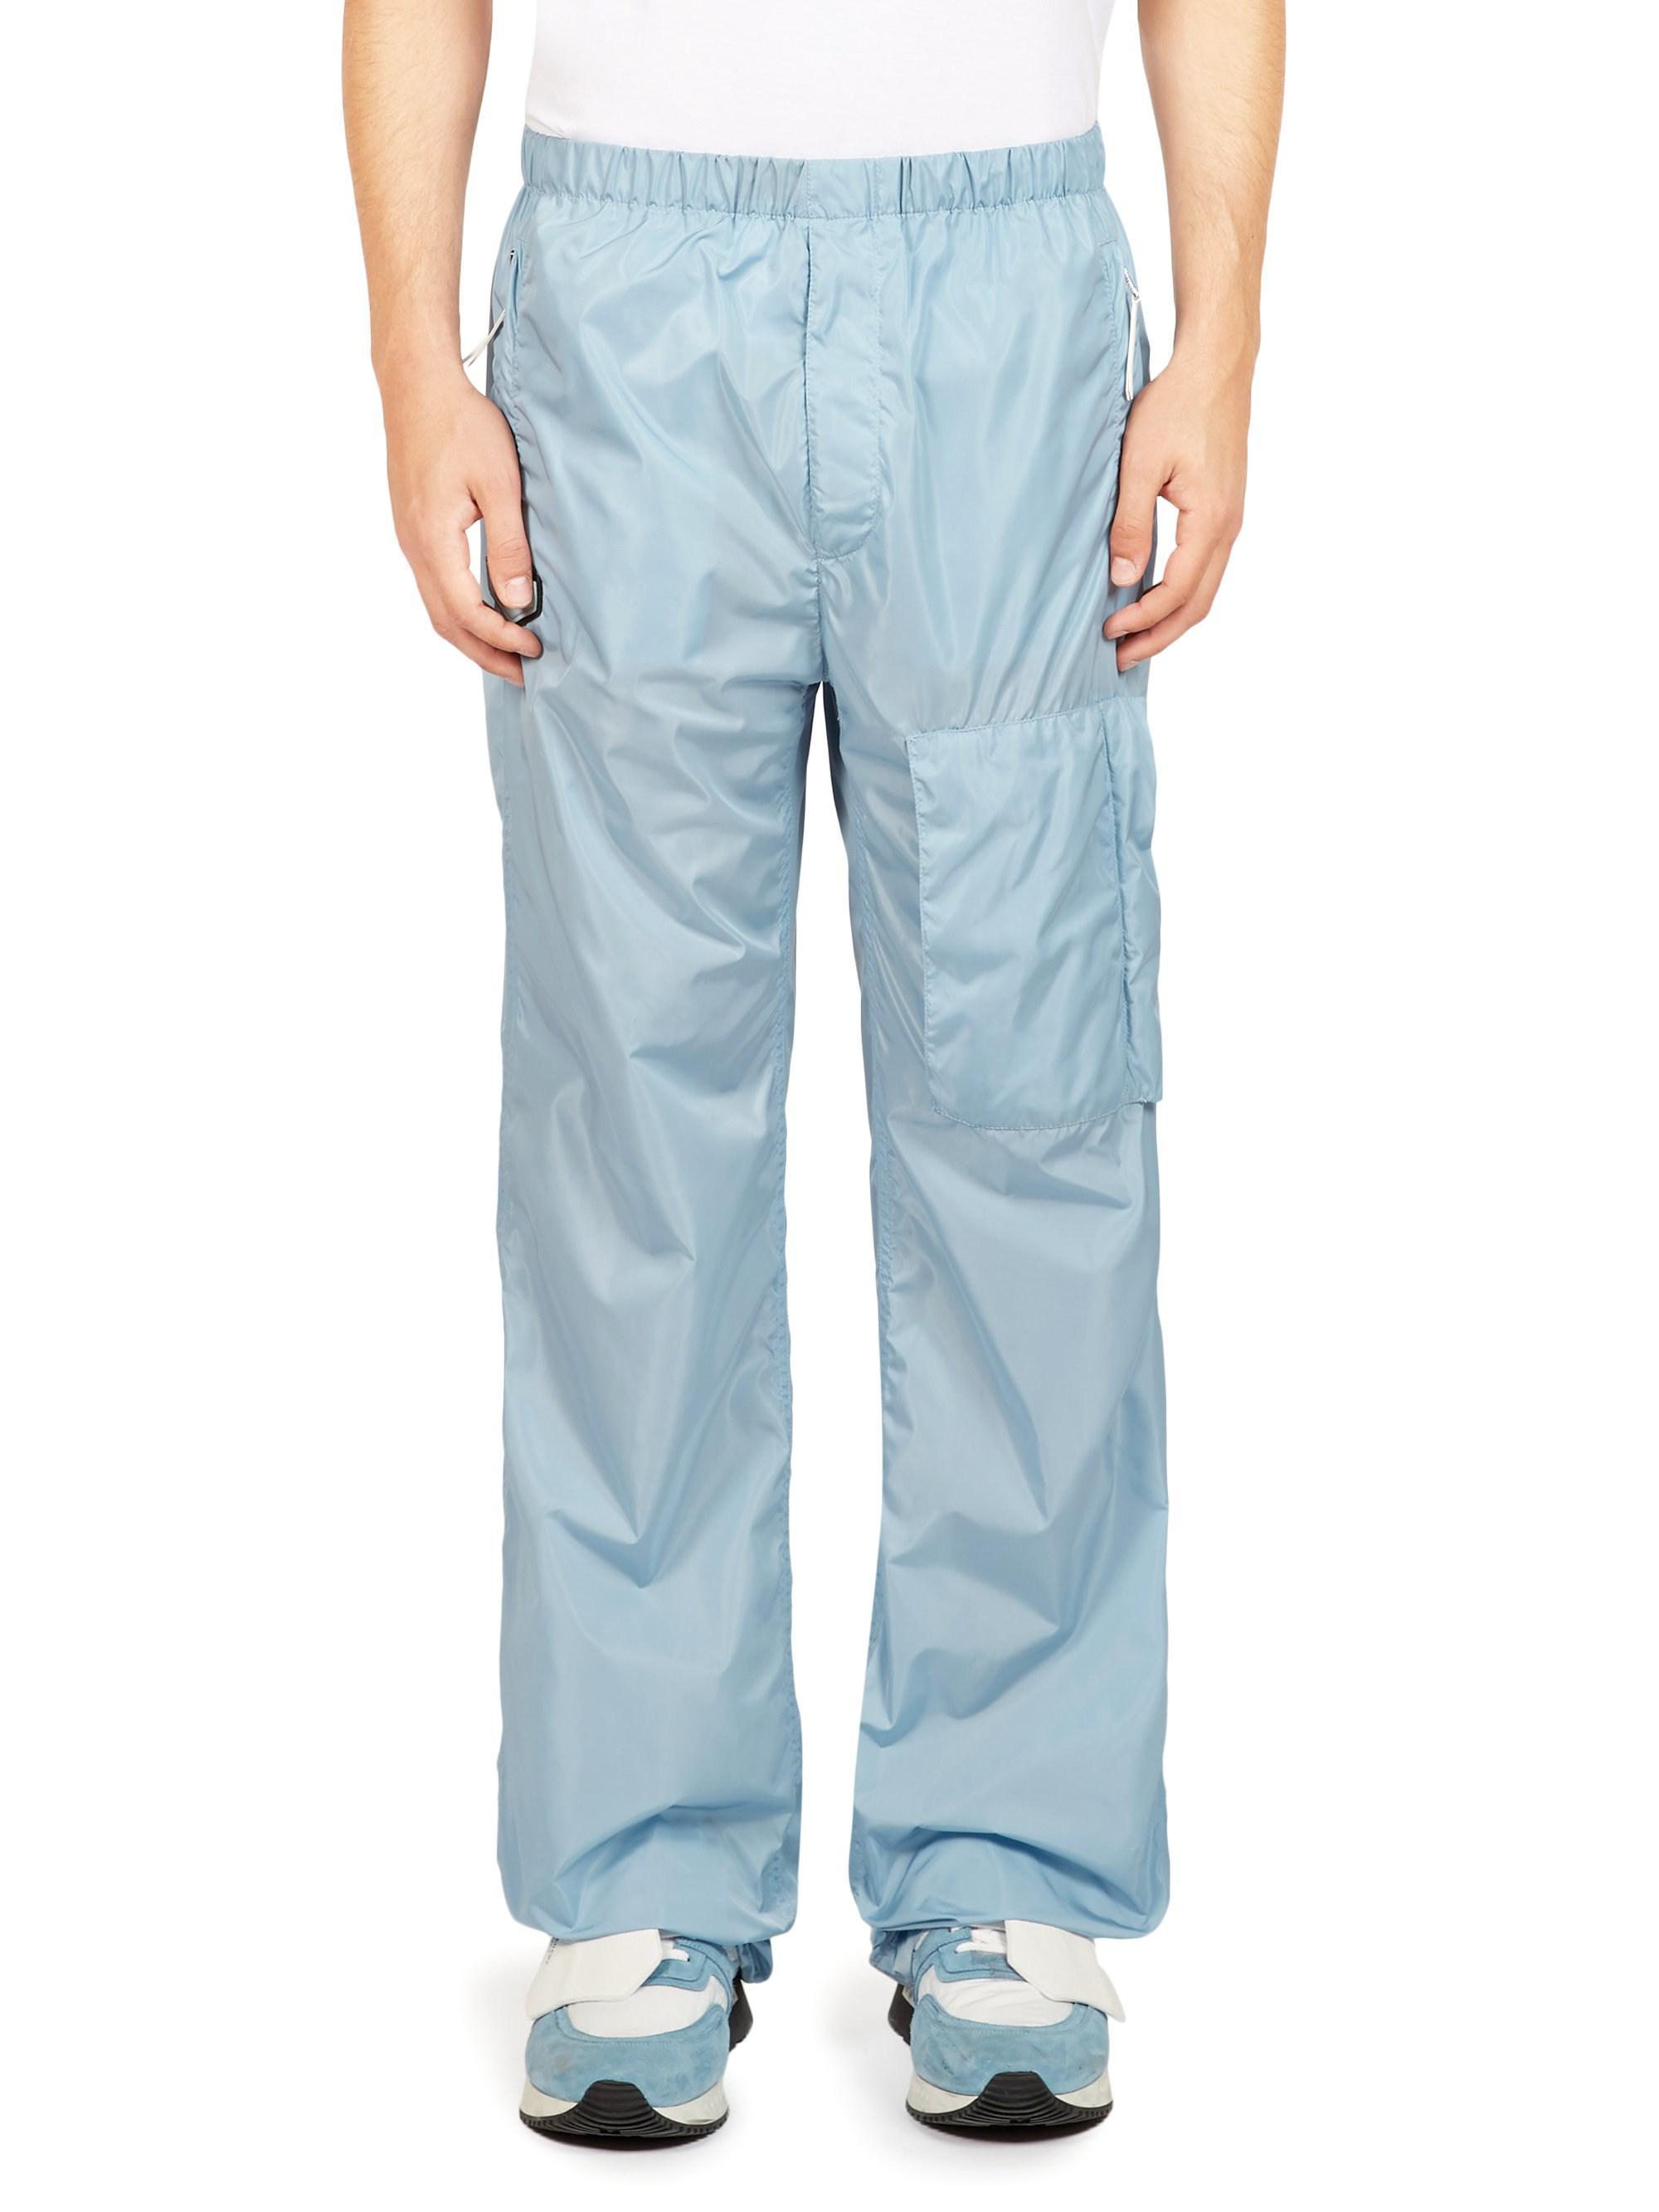 2b3d0d69b76a Givenchy nylon parachute pants in blue for men lyst jpg 2000x2667 Nylon  parachute pants